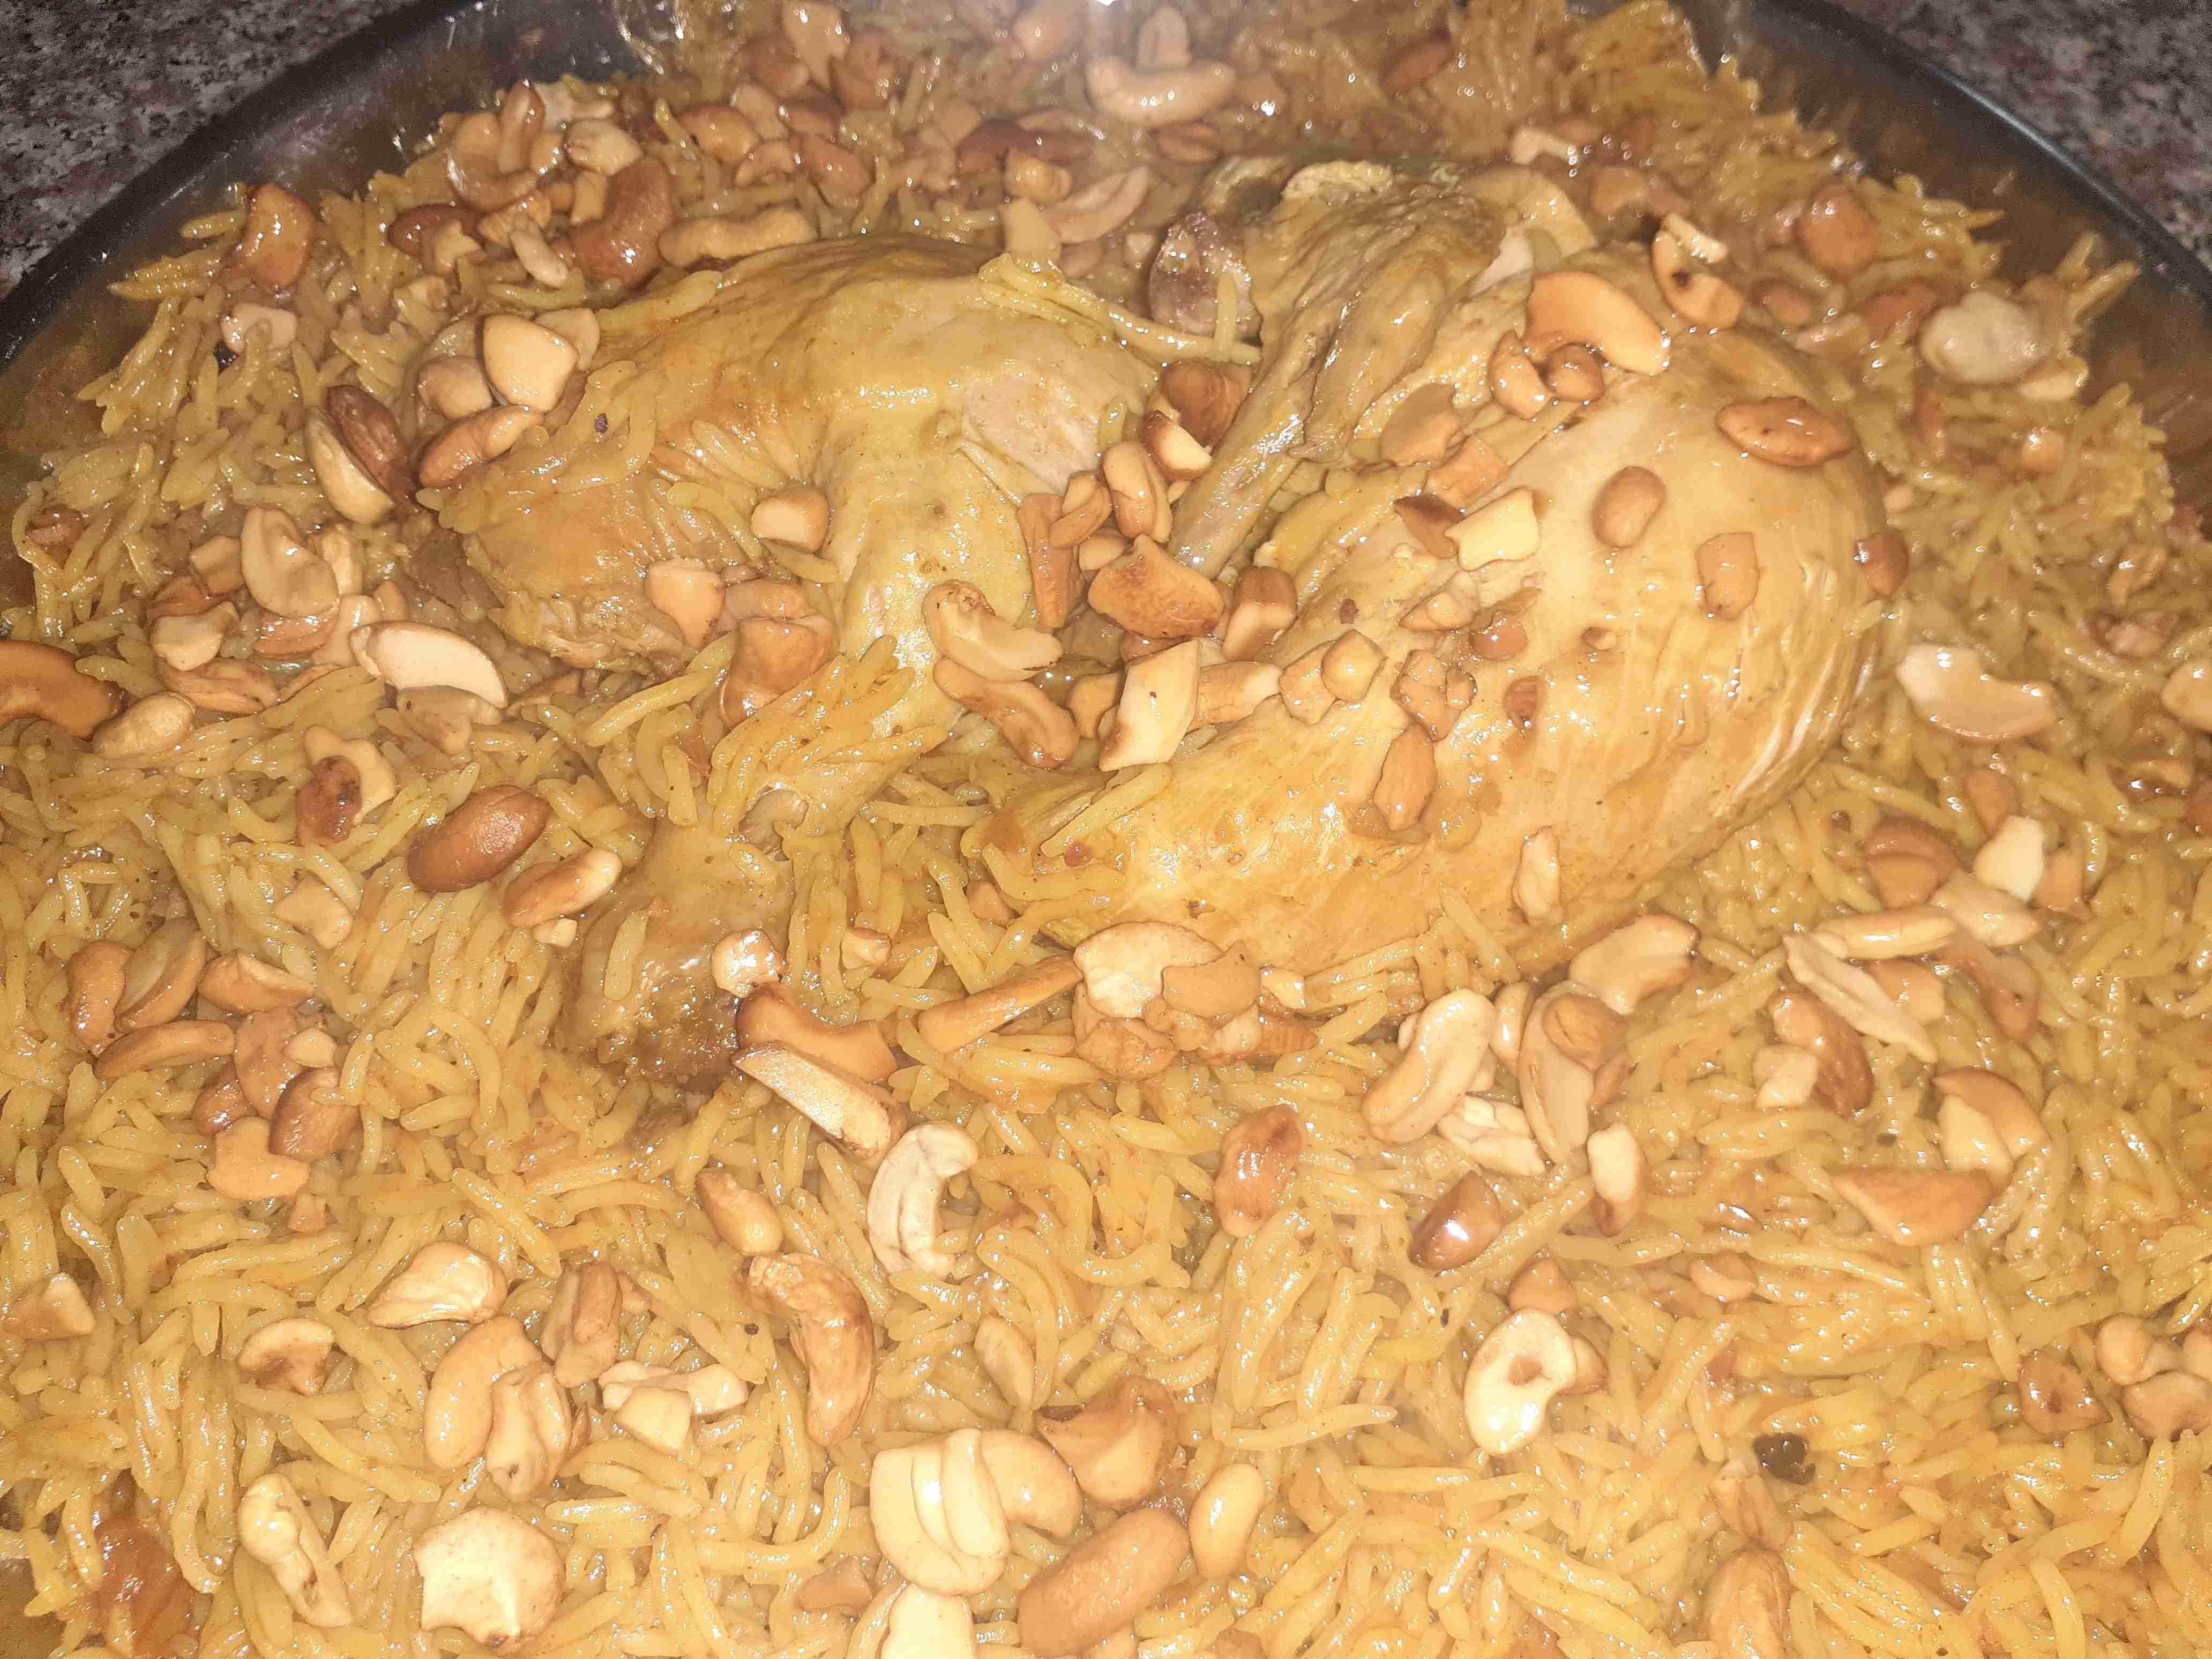 مضغوط الدجاج ملكة رمضان زاكي Recipe Main Dishes Food Dishes